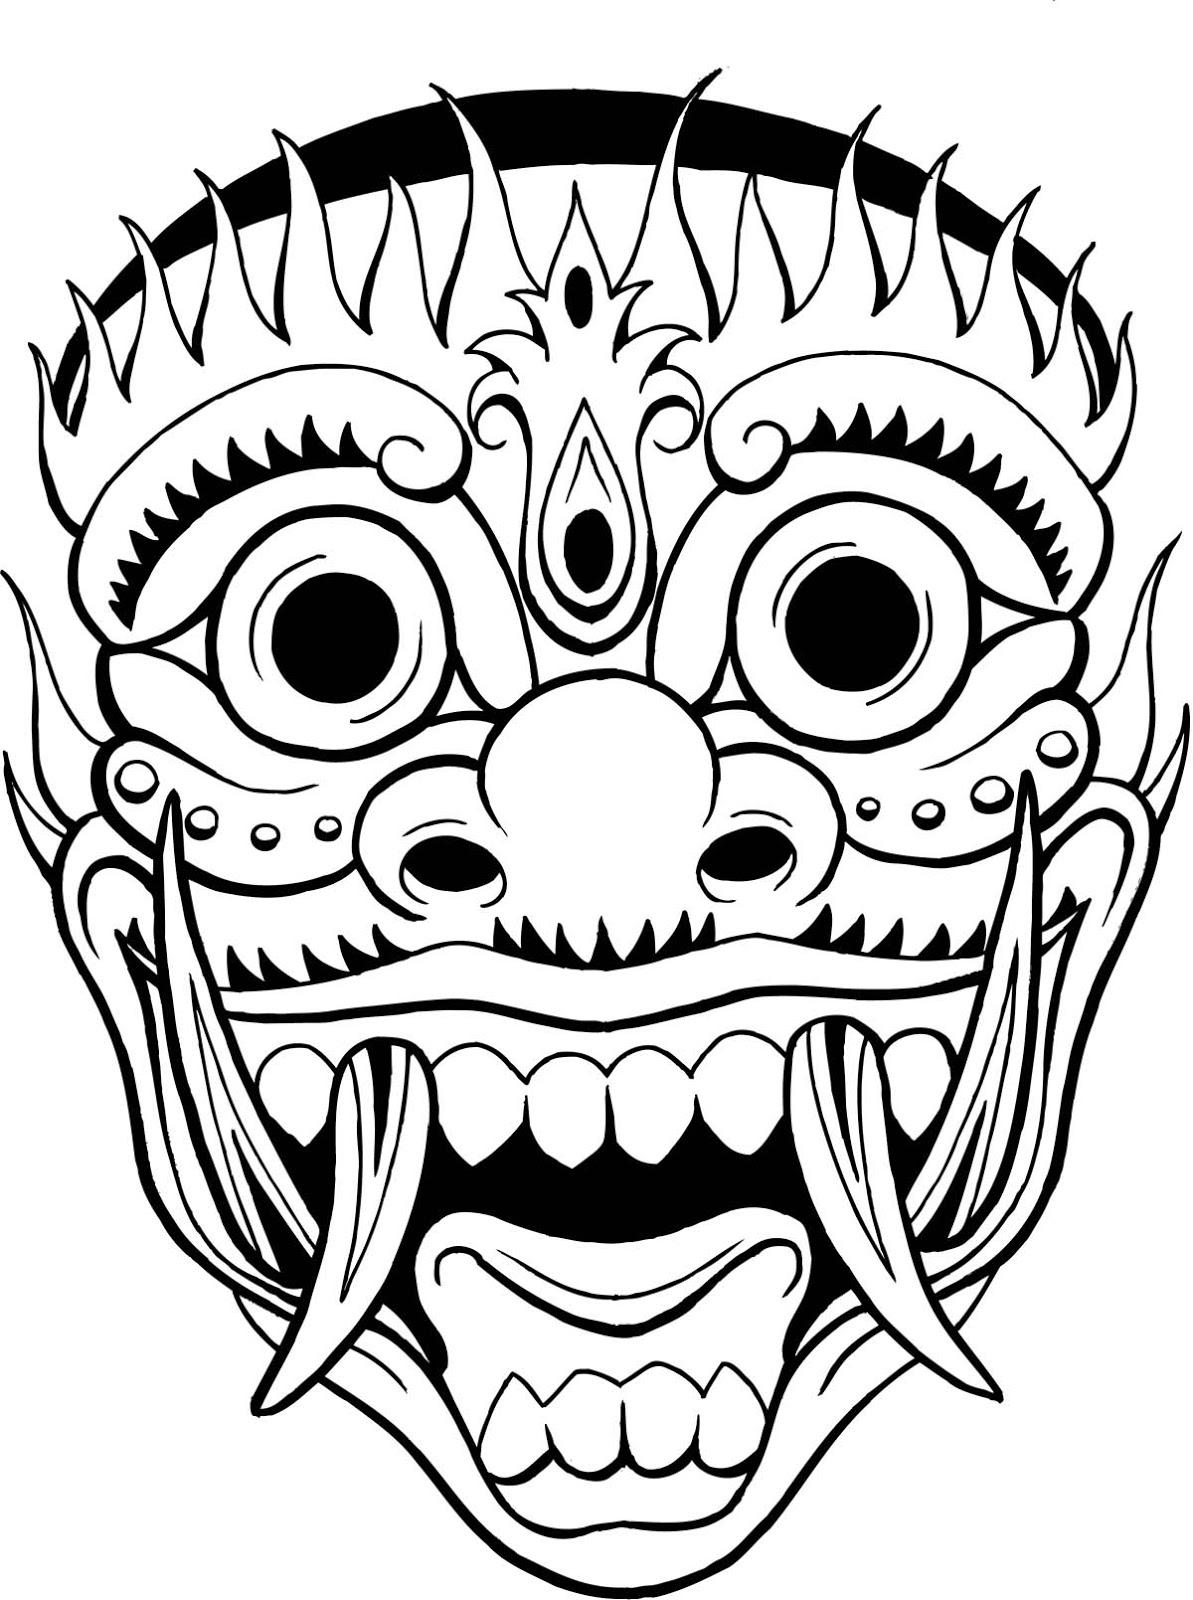 inca indian masks creativehobby store Buffalo Native American Mask banner tattoo ideas tattoo design ideas native american masks mayan death masks